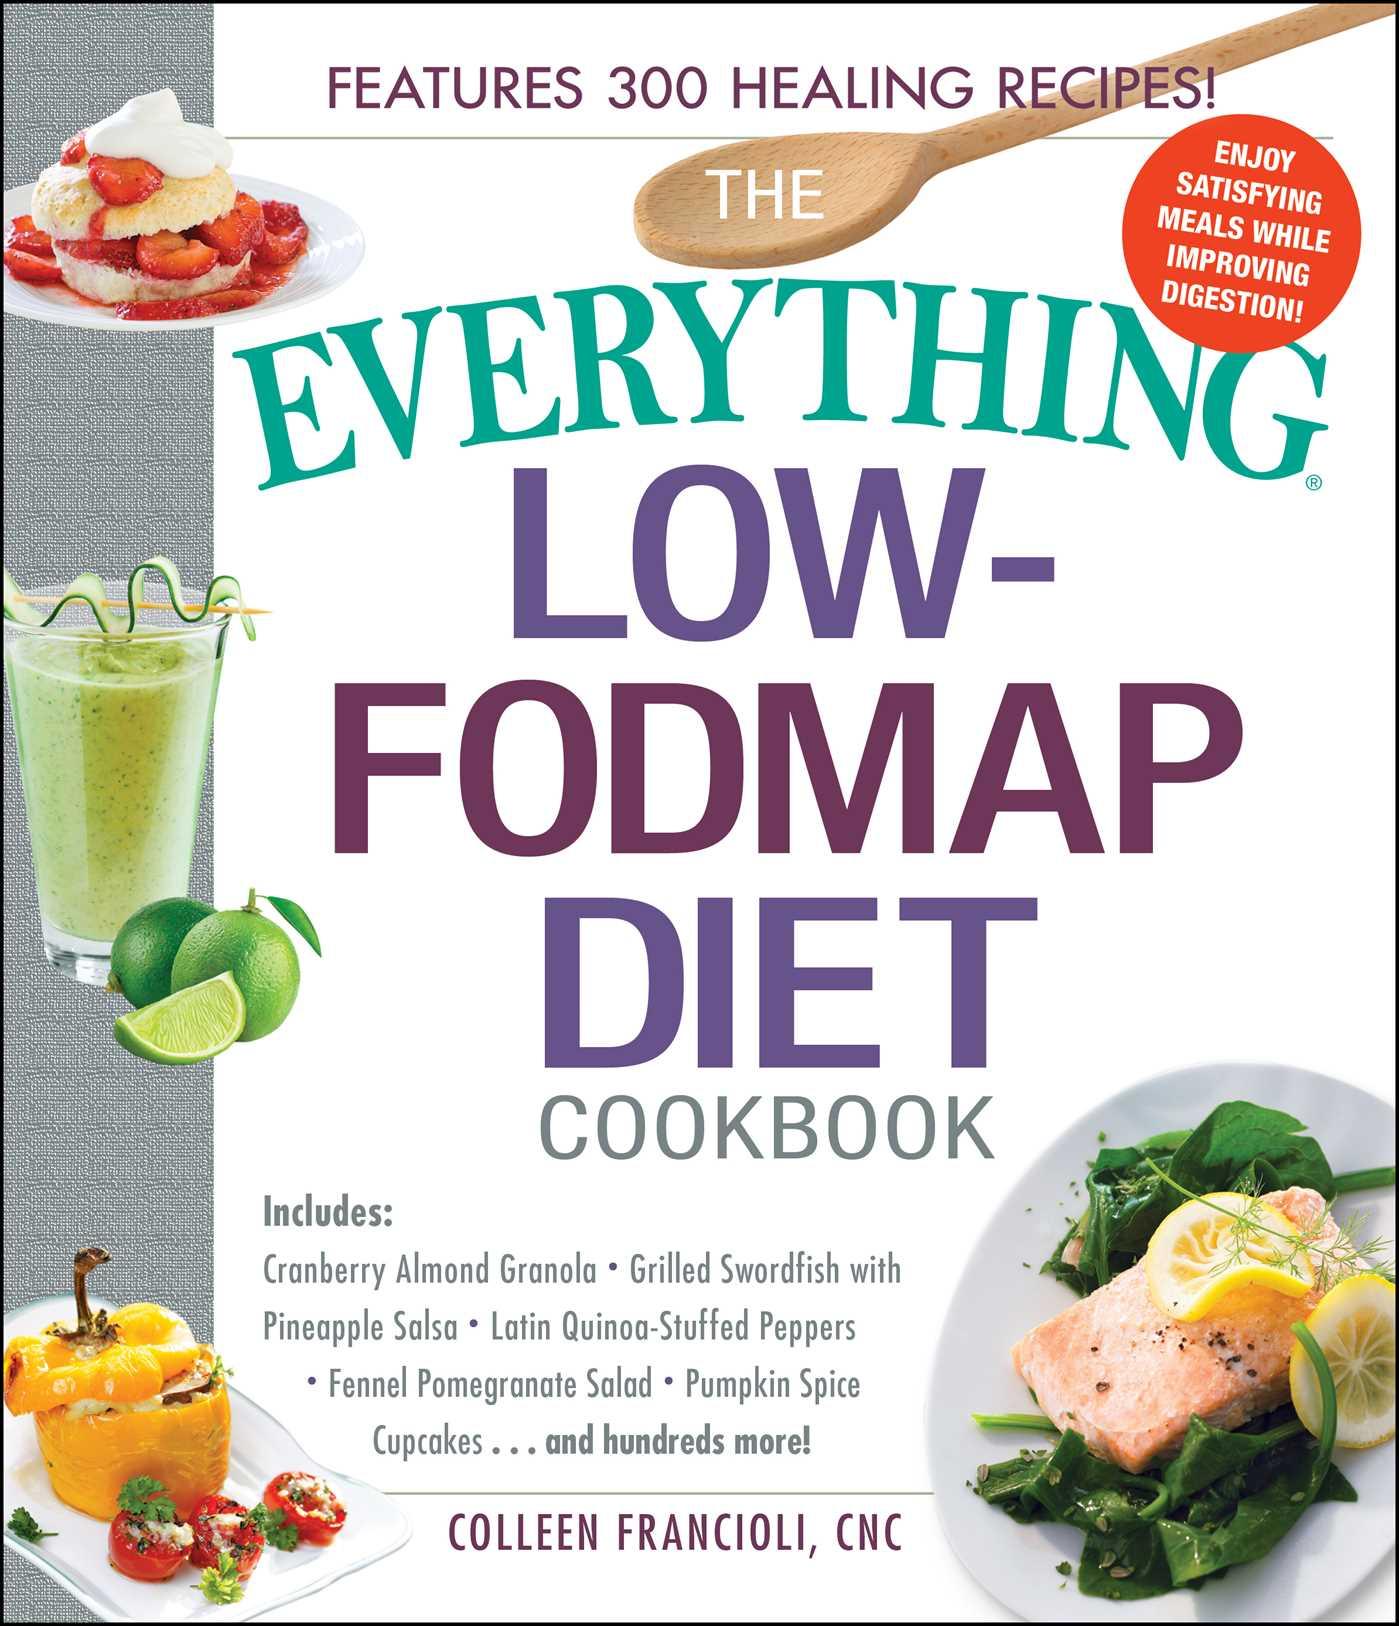 The everything low fodmap diet cookbook 9781440595295 hr